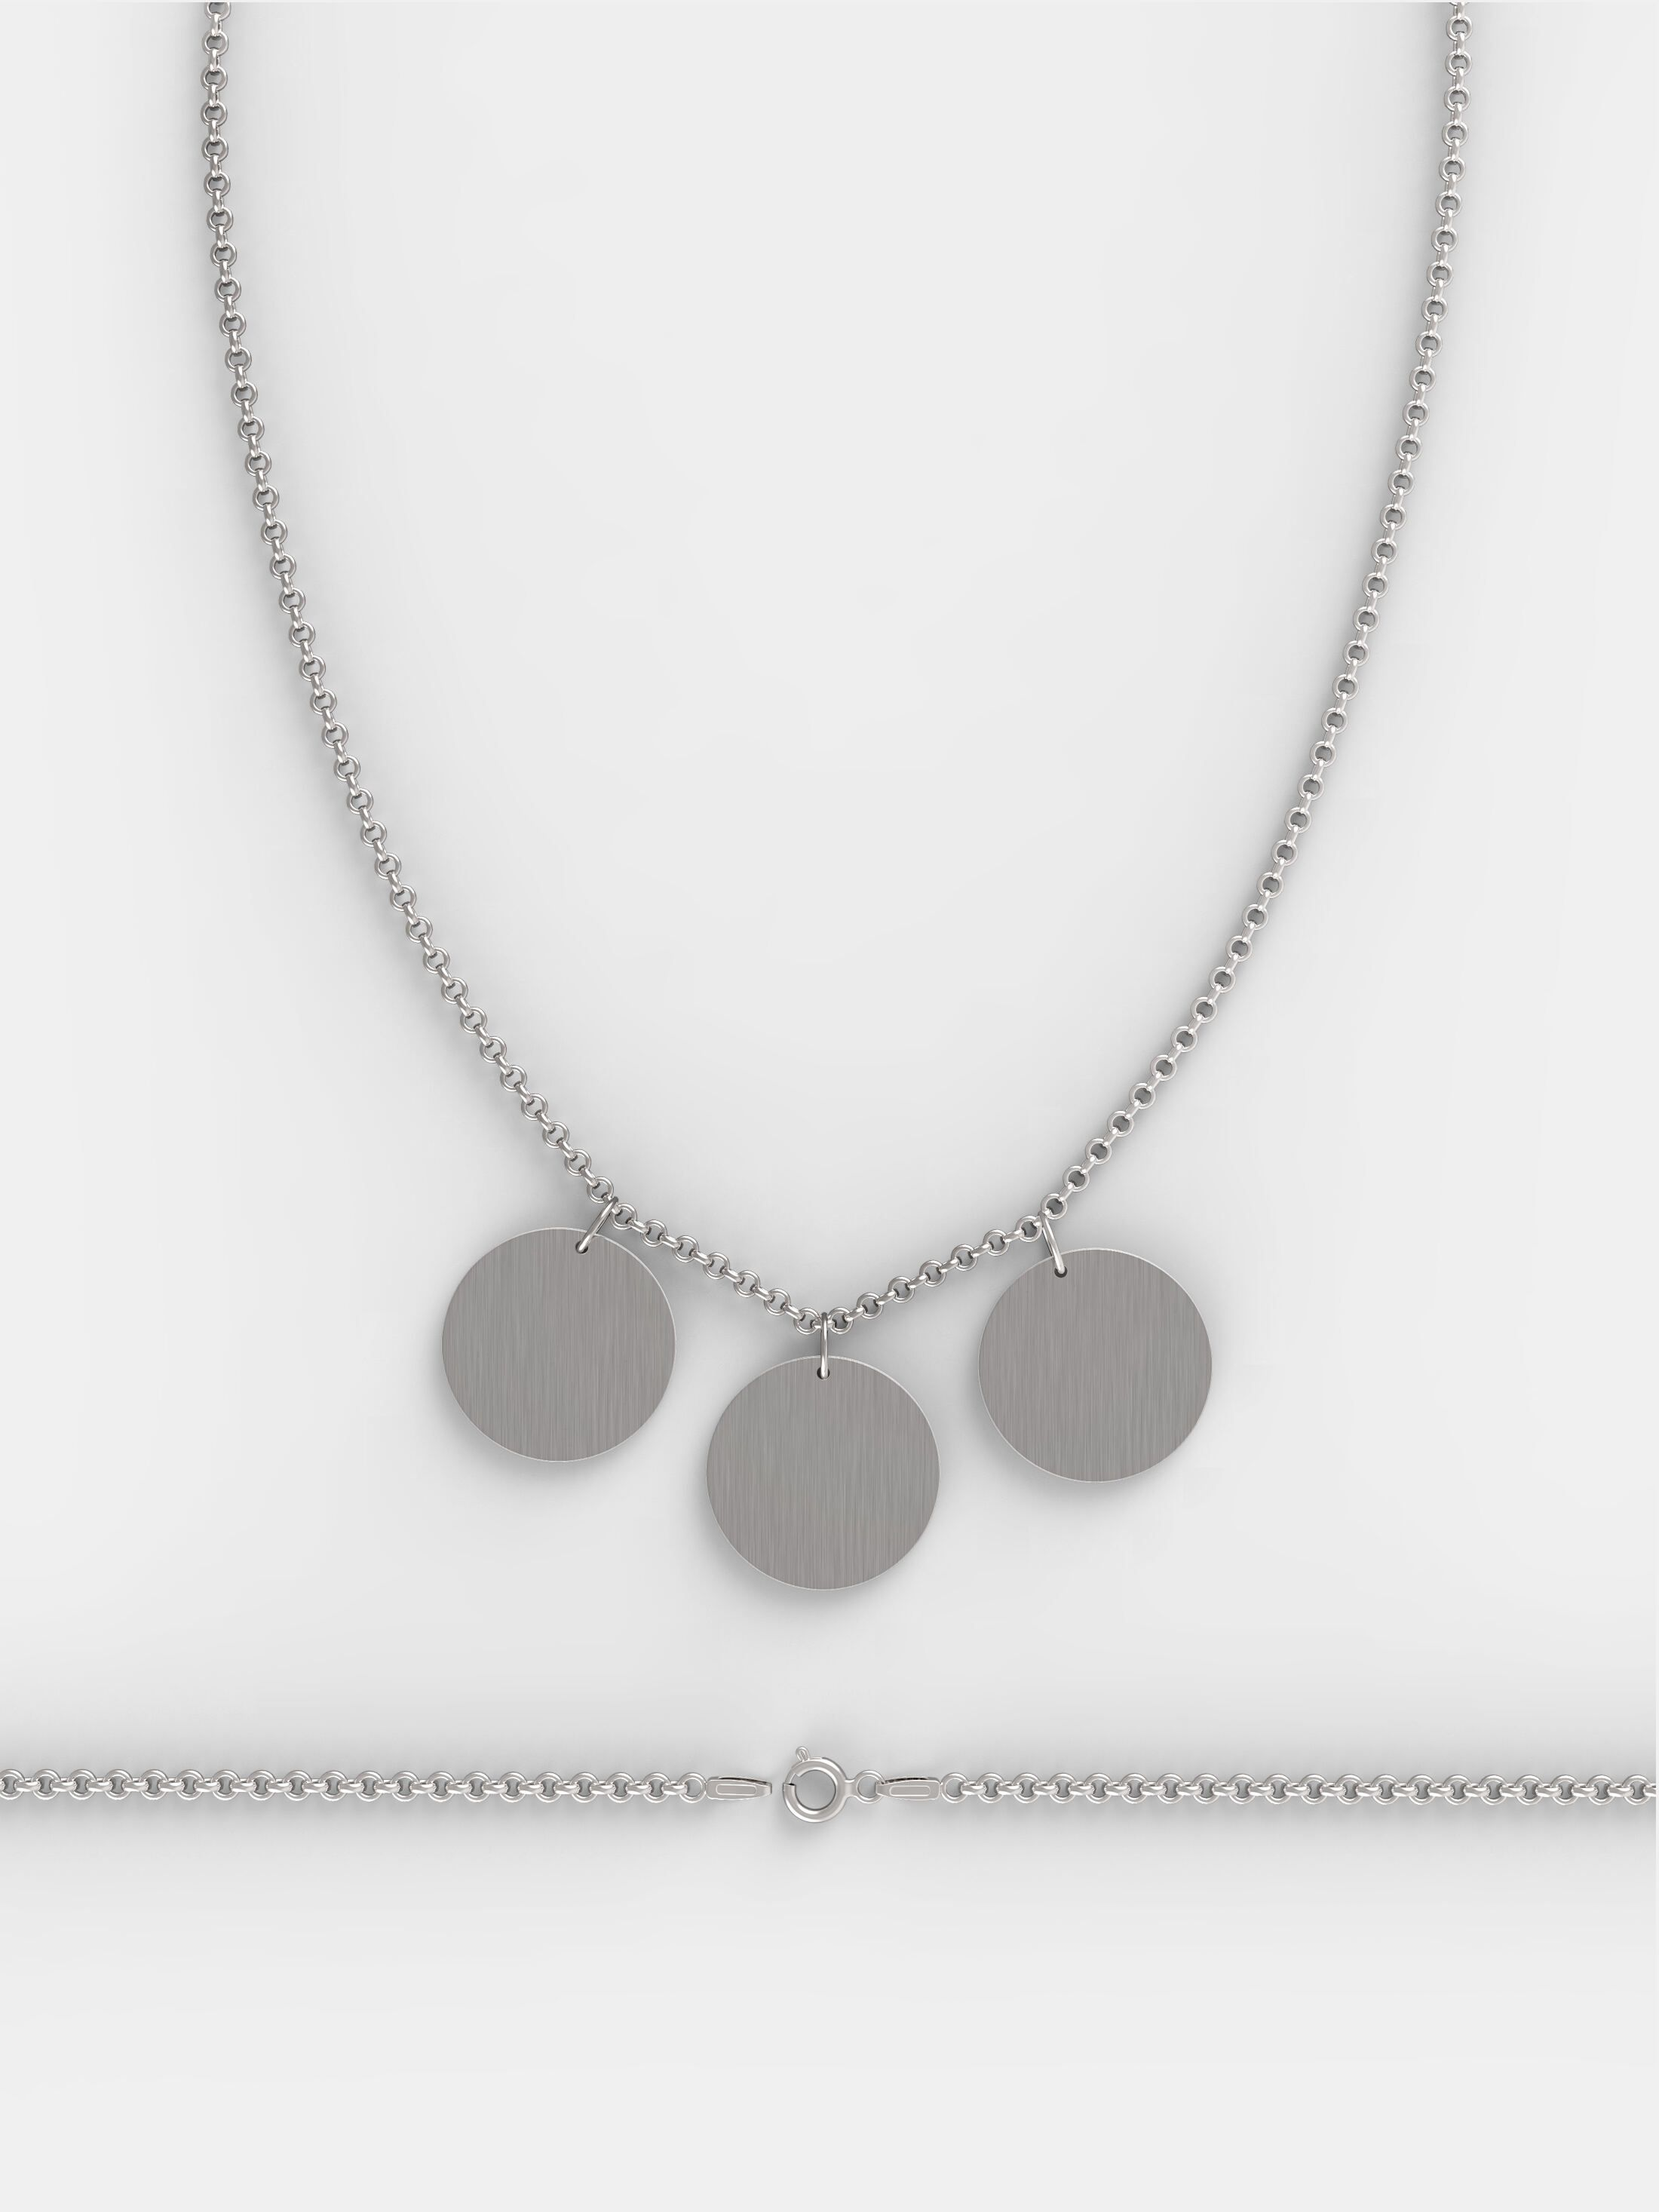 Designa ditt eget halsband